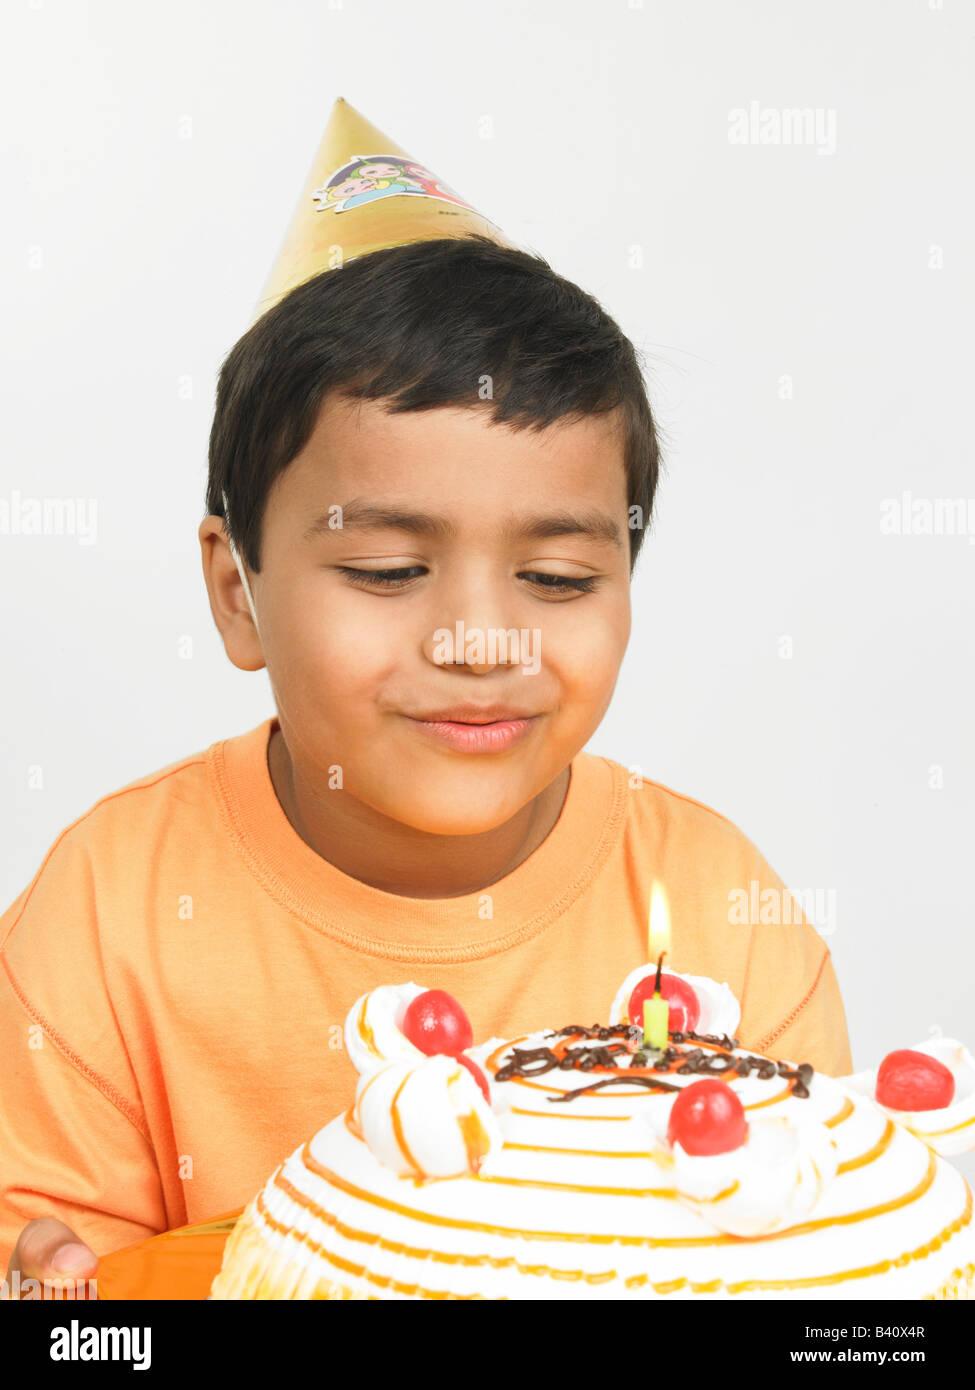 Surprising Asian Boy Of Indian Origin With His Birthday Cake Wearing Orange Funny Birthday Cards Online Chimdamsfinfo